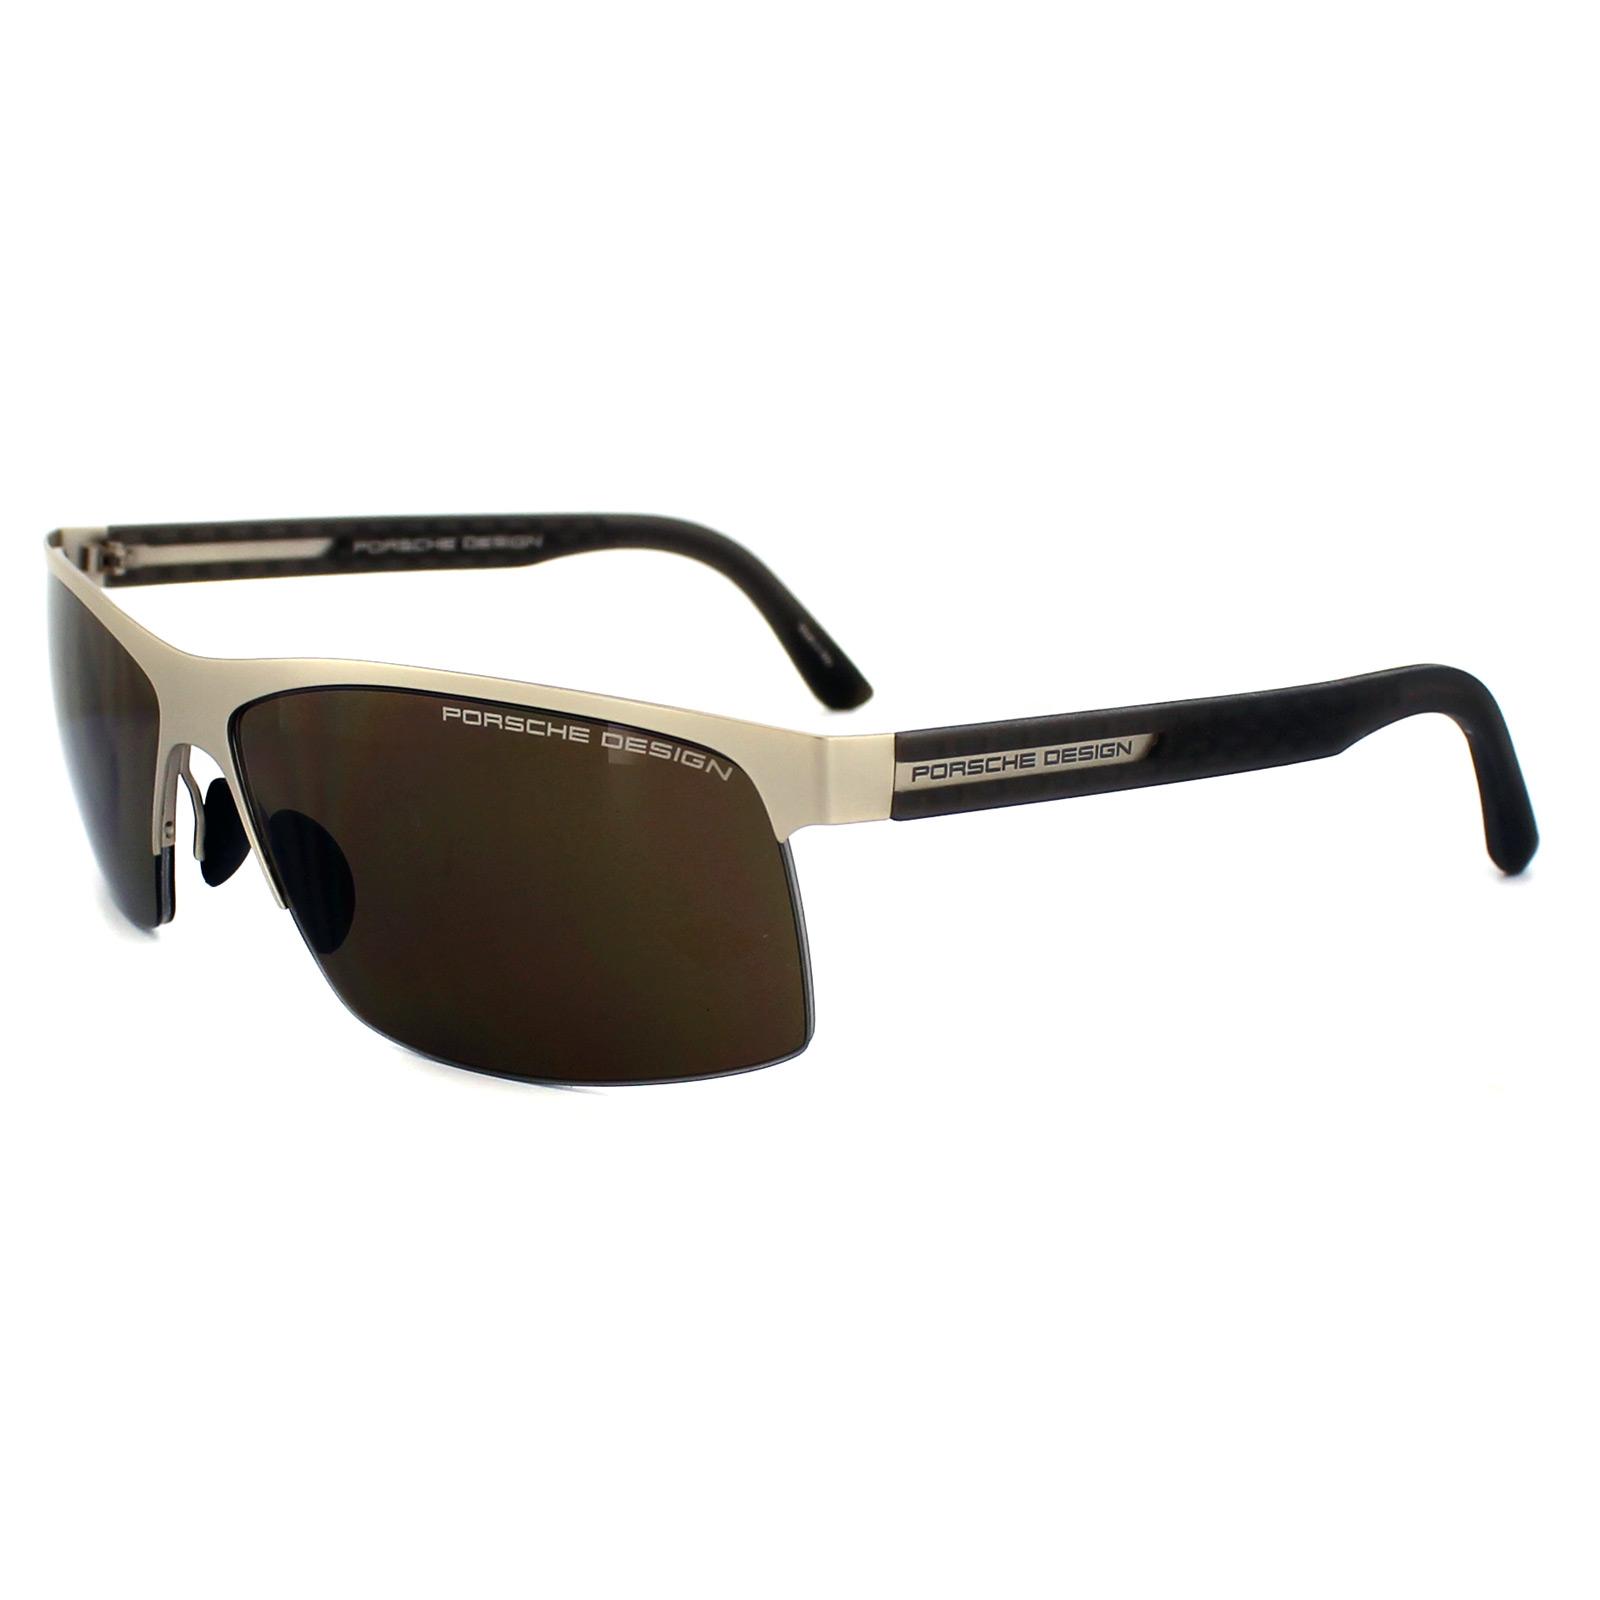 Cheap Porsche Design P8561 Sunglasses Discounted Sunglasses